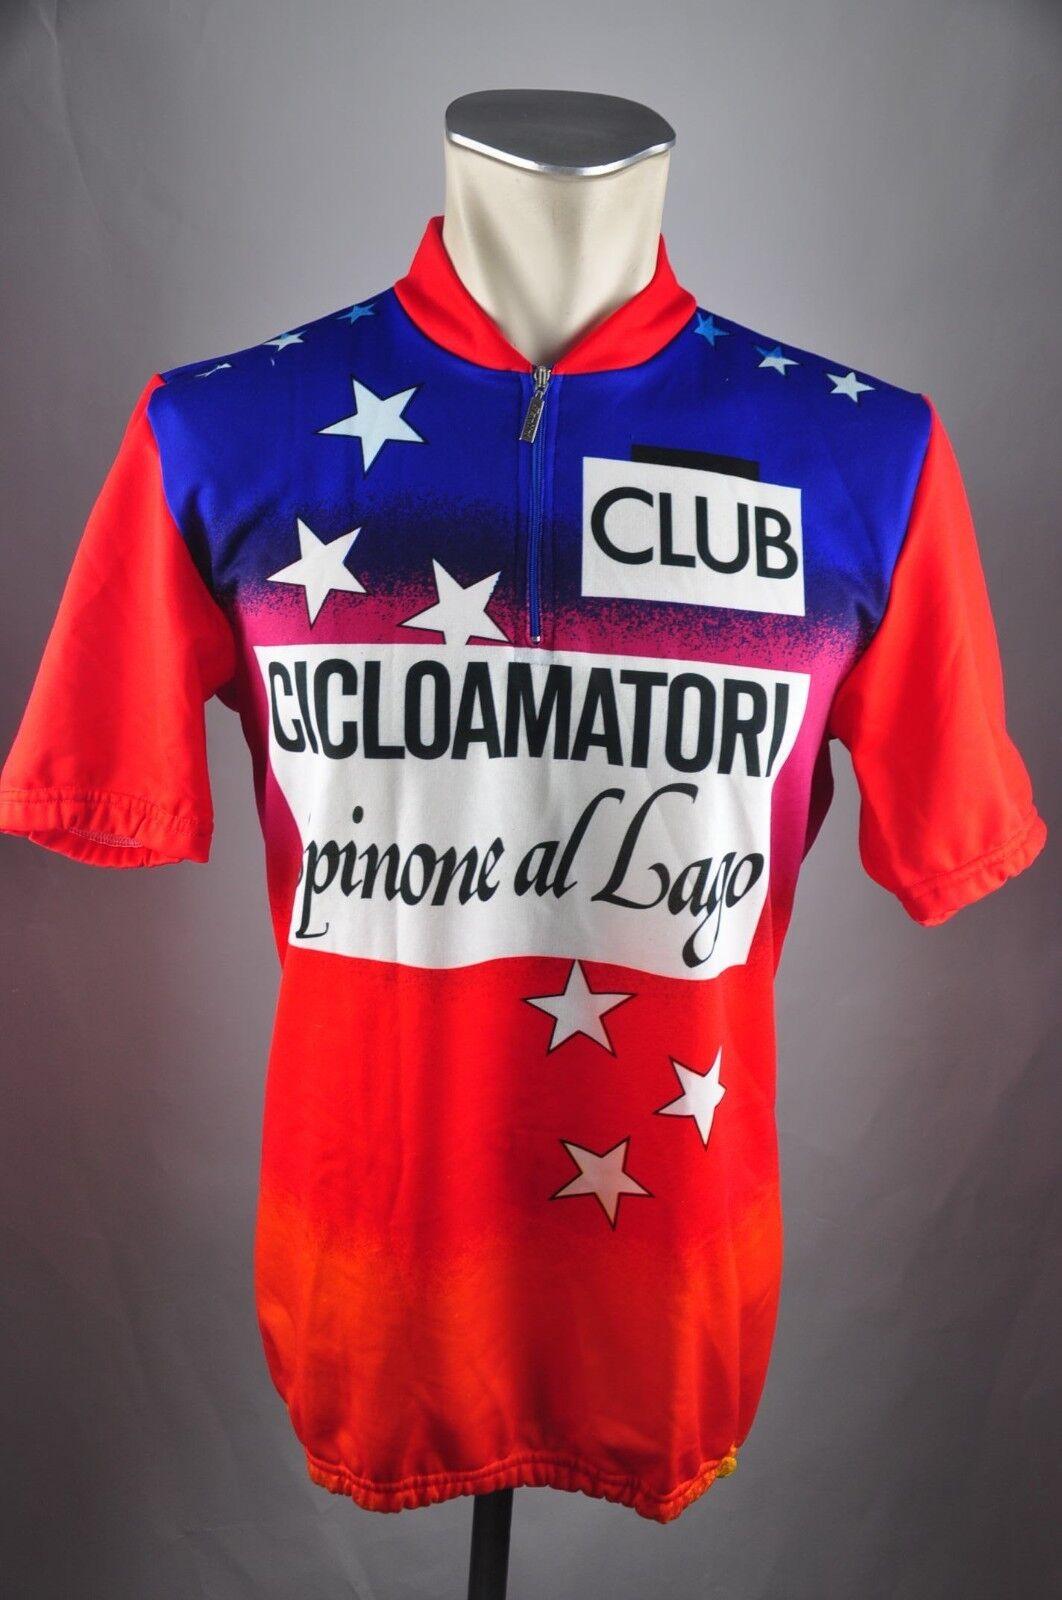 Cicloamatori Lago Santini Rad Trikot Gr. XL BW 55cm Bike cycling jersey FZ1